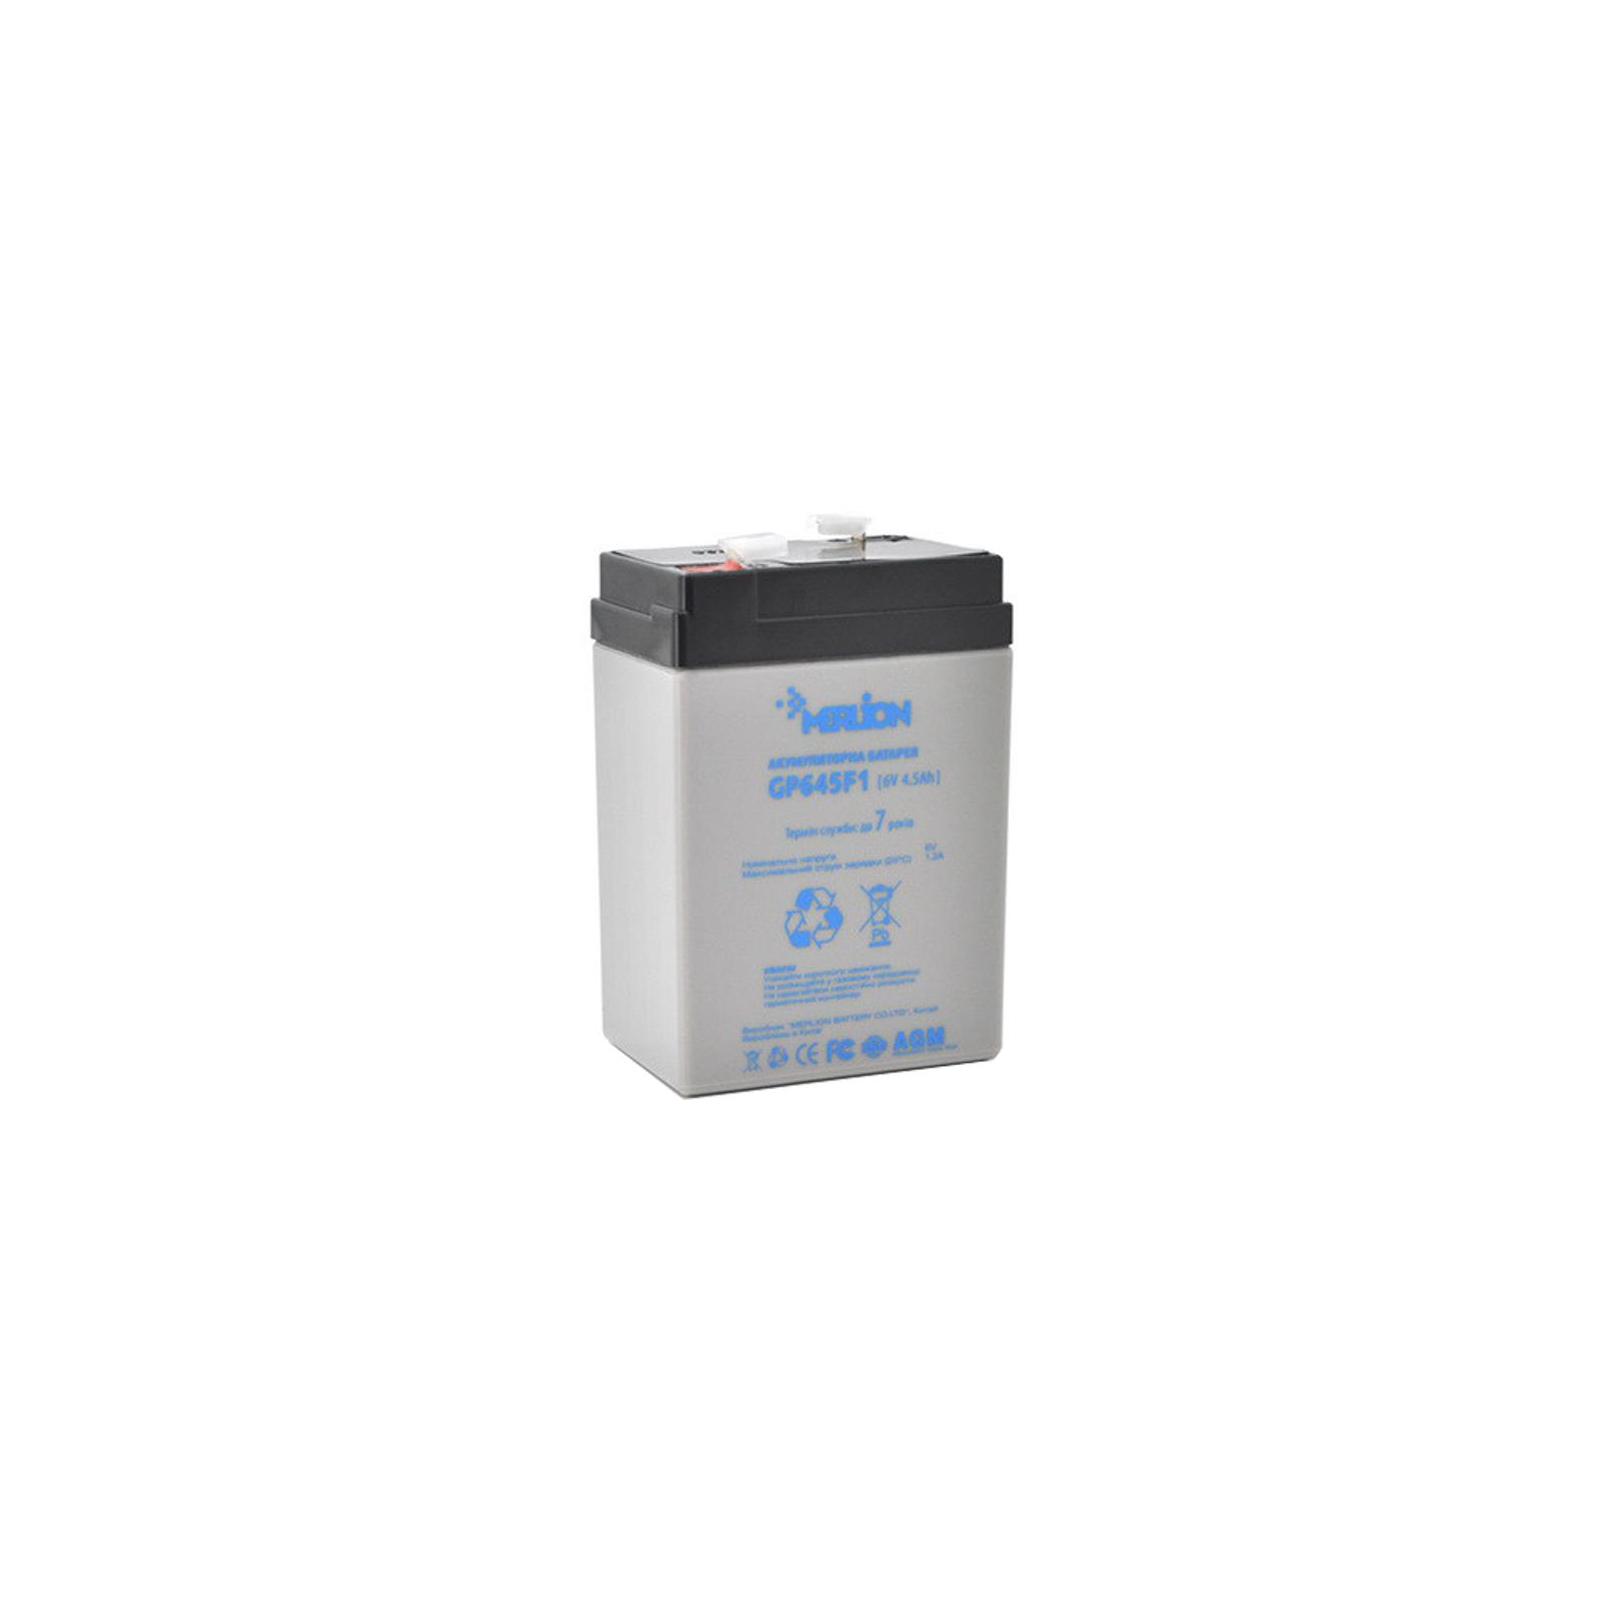 Батарея к ИБП Merlion 6V-4.5Ah (GP645F1)